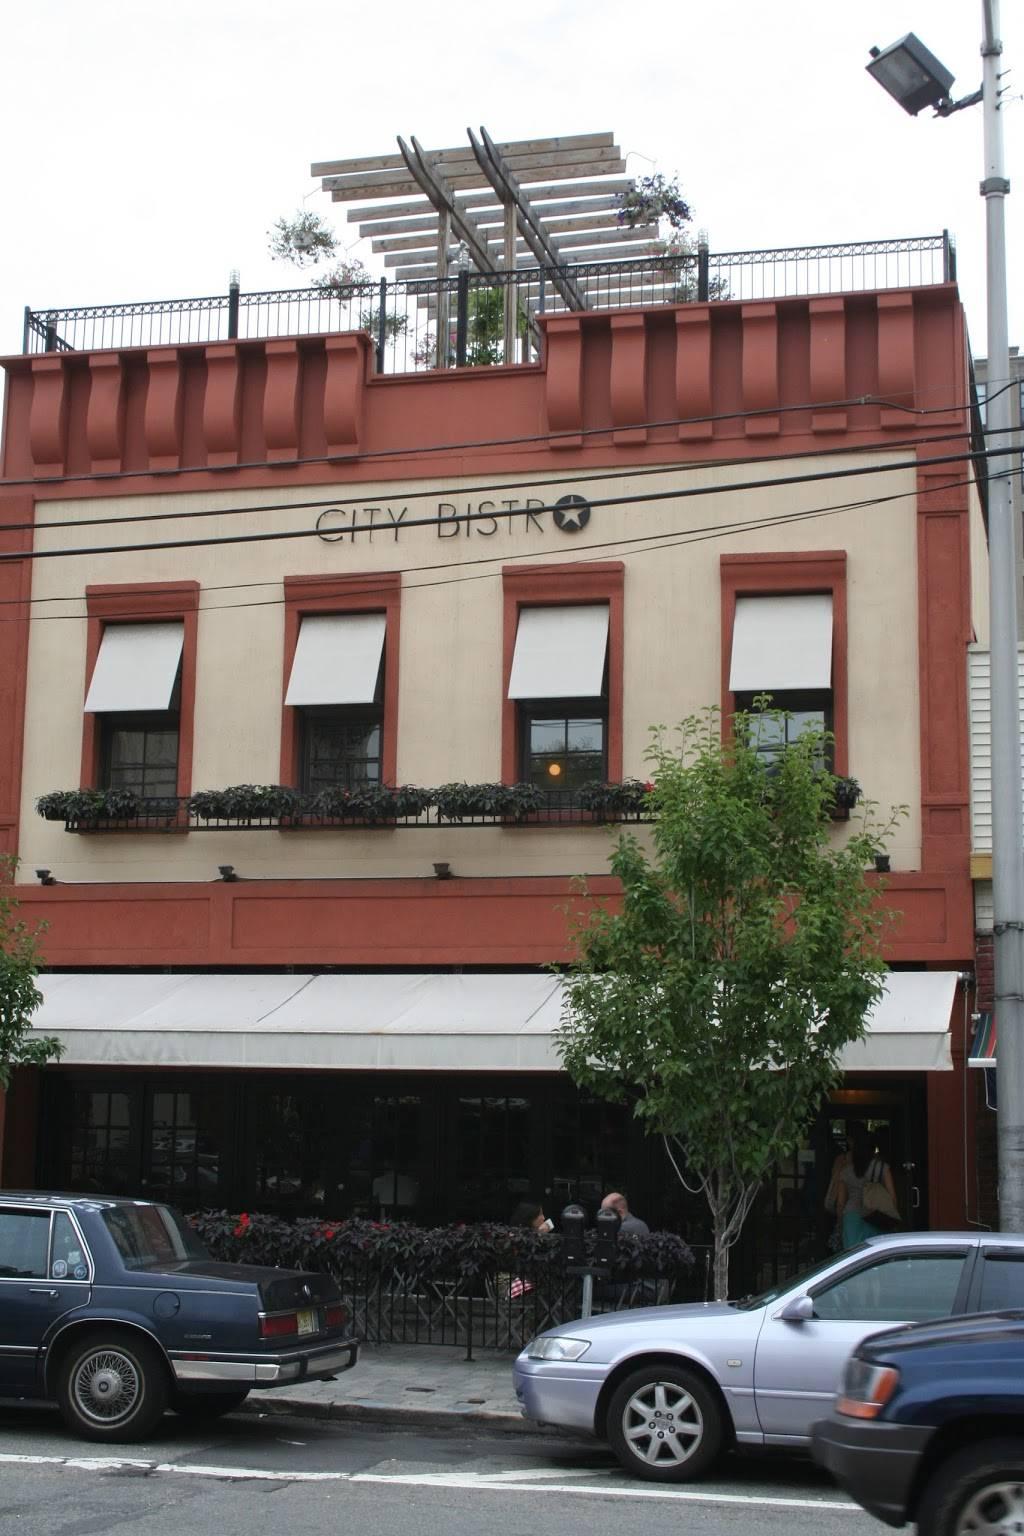 City Bistro | night club | 56 14th St, Hoboken, NJ 07030, USA | 2019638200 OR +1 201-963-8200